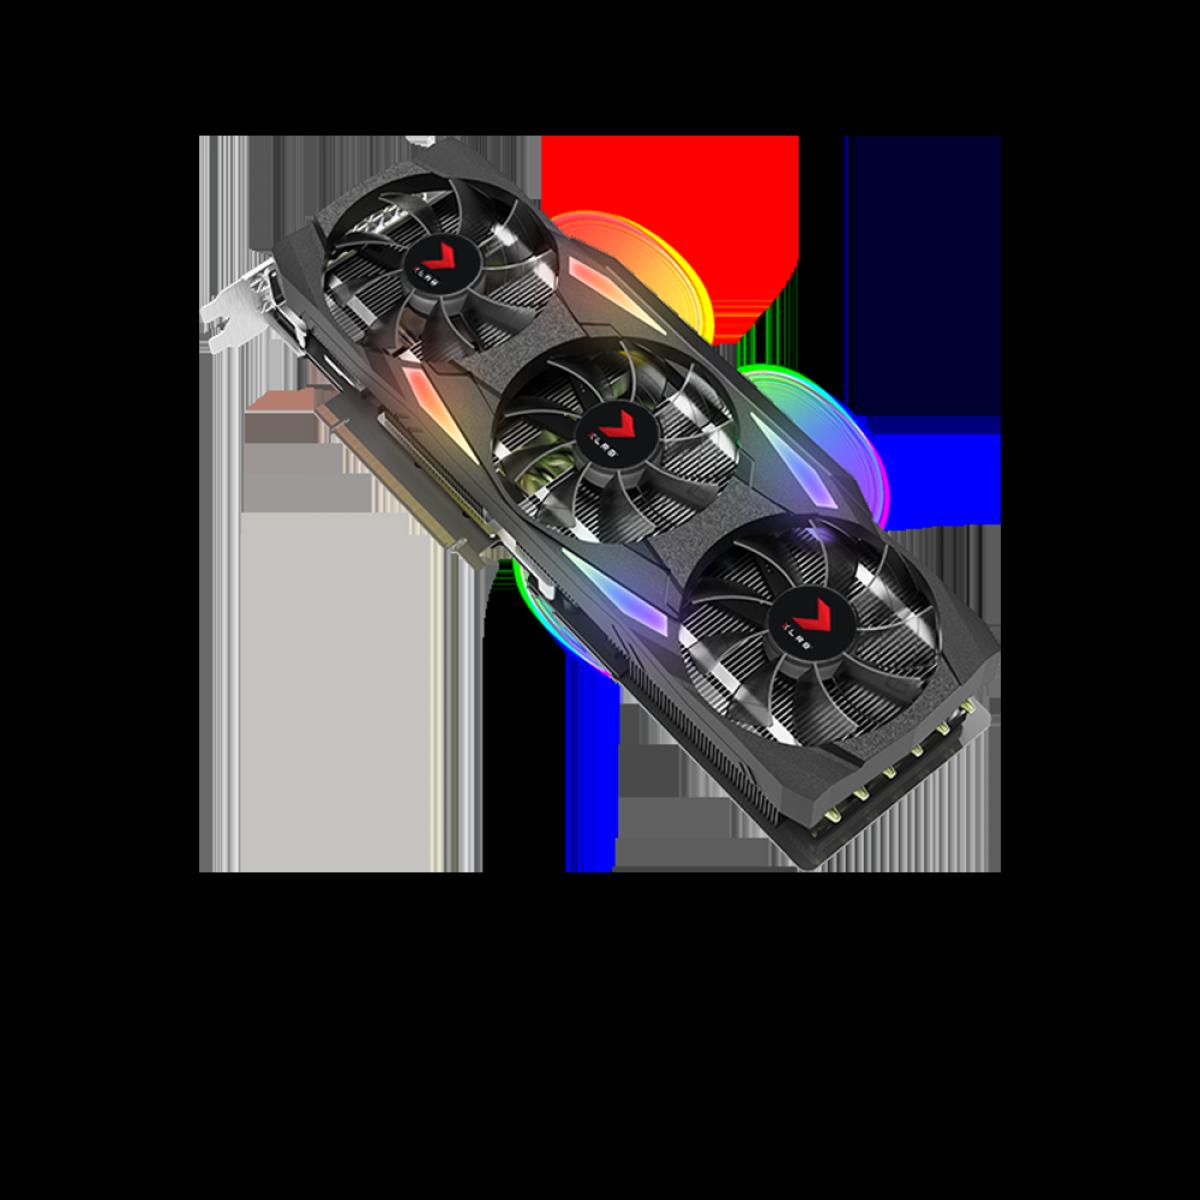 Placa de Vídeo PNY GeForce, RTX 3090 XLR8 Gaming EPIC-X RGB Triple, 24GB, GDDR6X, 384Bit, VCG309024TFXMPB